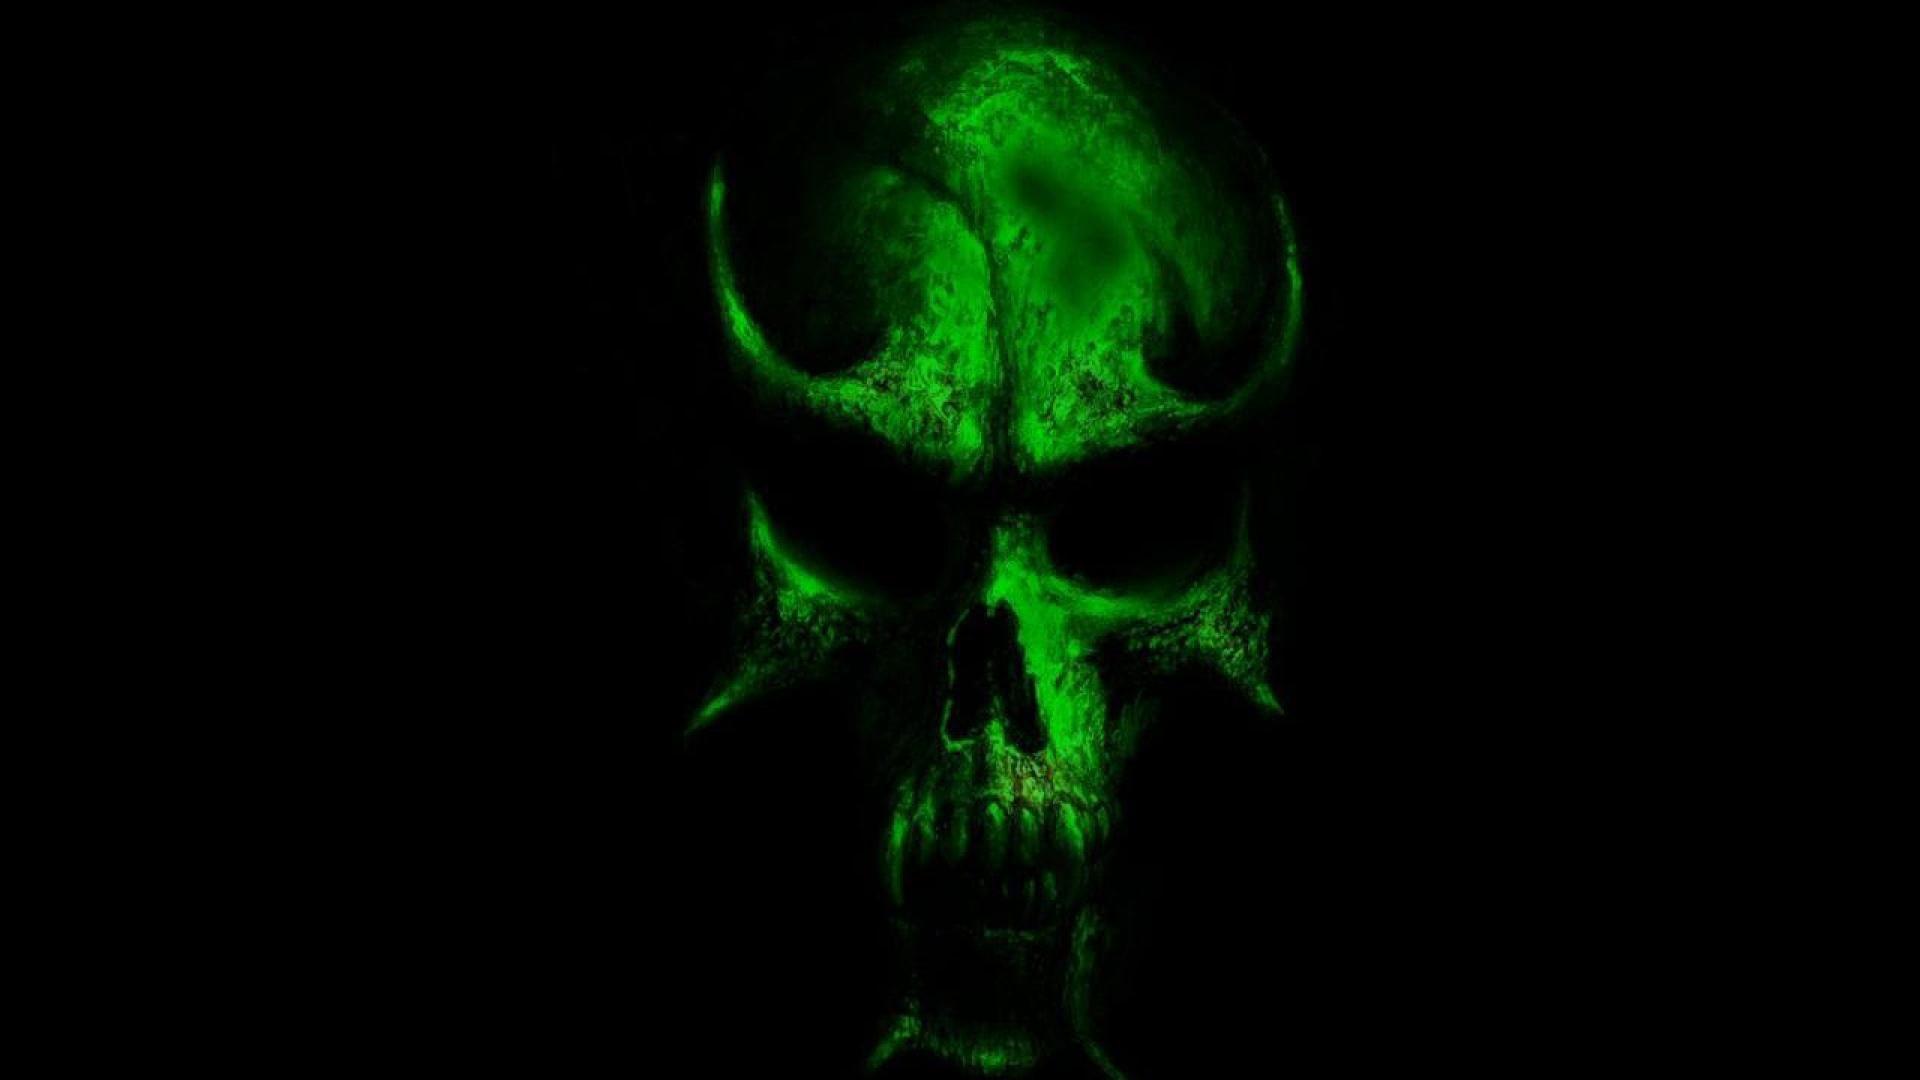 Incredible Neon Skull Wallpaper: Green Skull Wallpaper (53+ Images